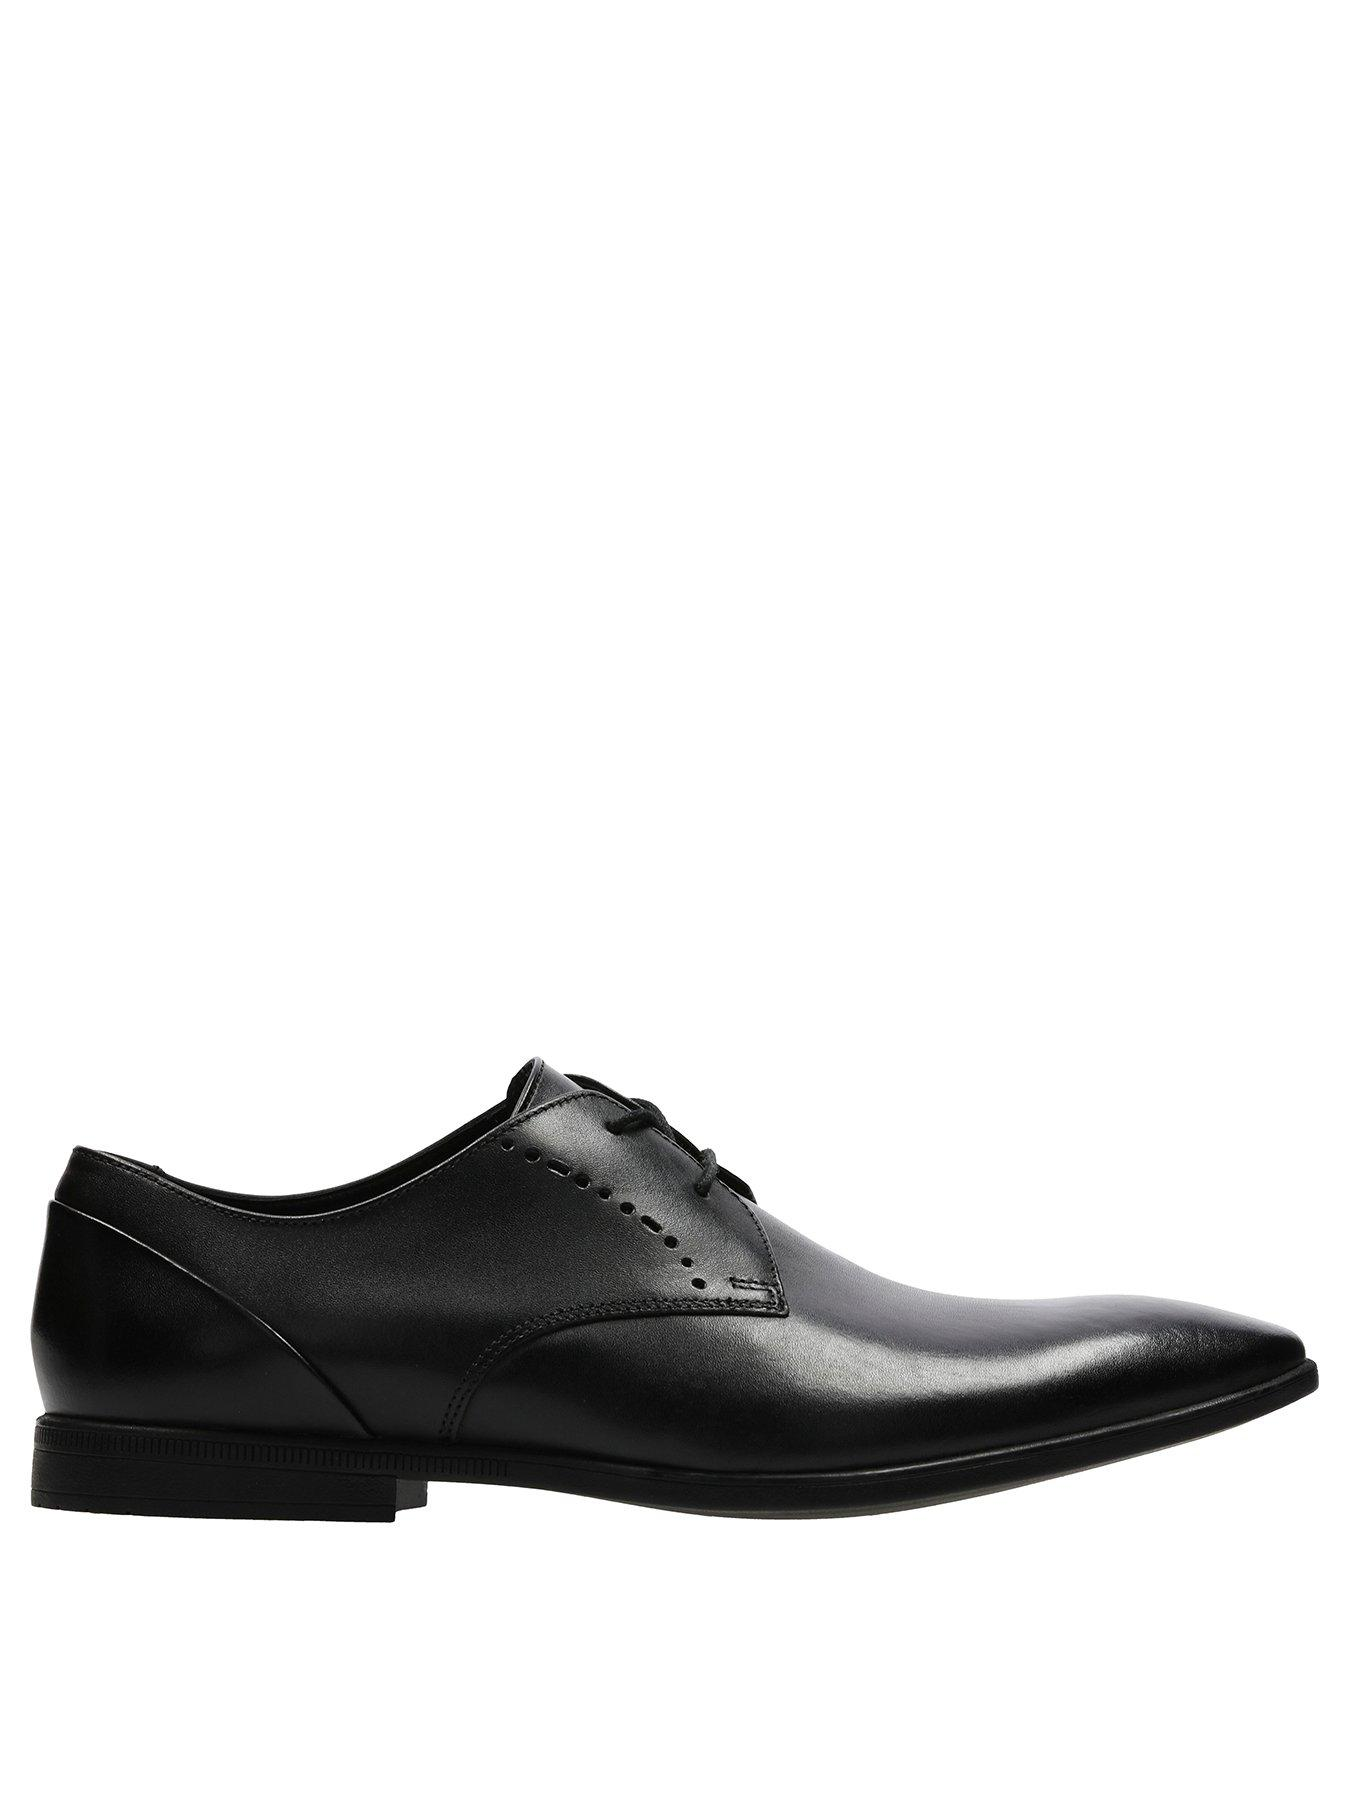 32 Best clarks shoe brief images